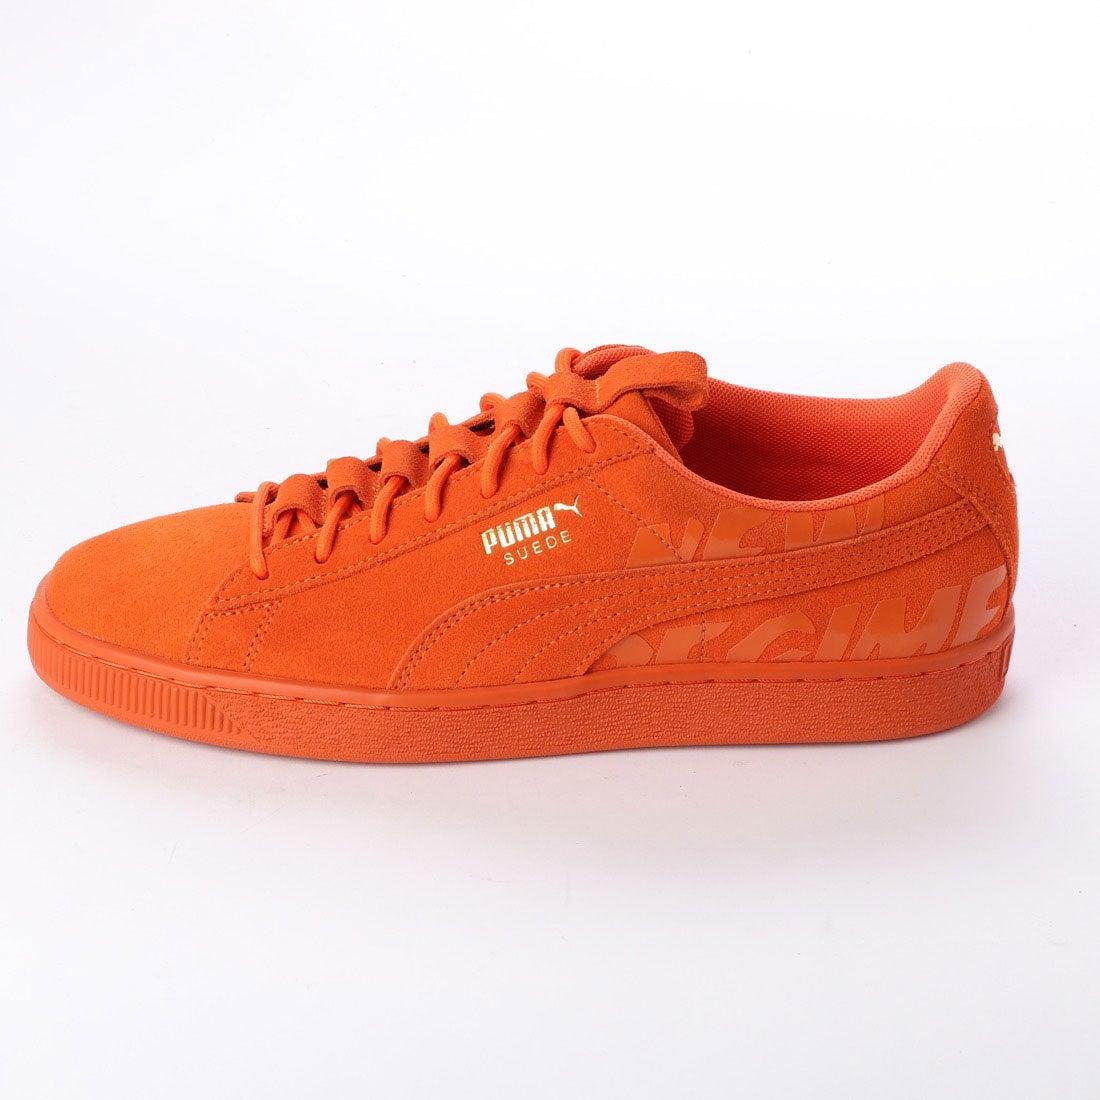 wholesale dealer 6fd4d c01a6 プーマ PUMA SUEDE ANR (SCARLET IBIS-SCARLET IBIS)-靴 ...